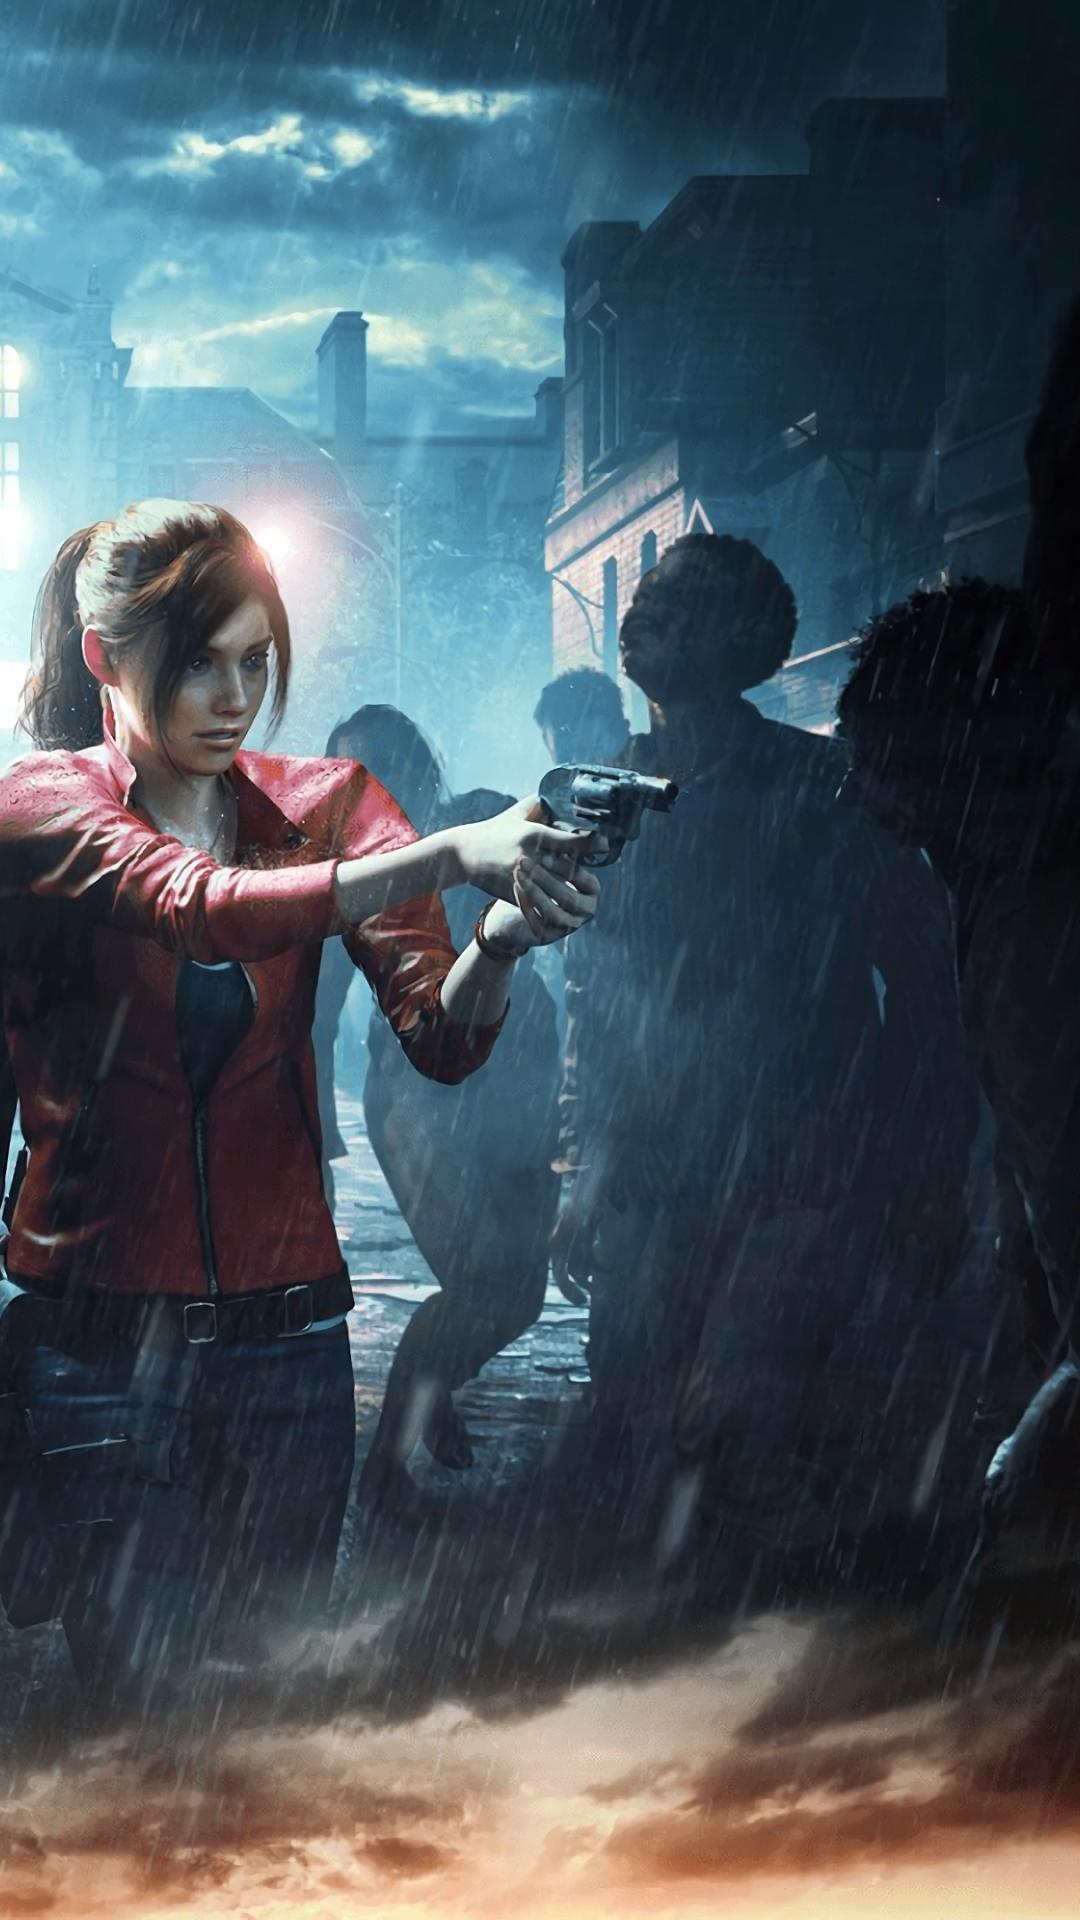 Resident Evil 2 2019 Wallpapers - Wallpaper Cave